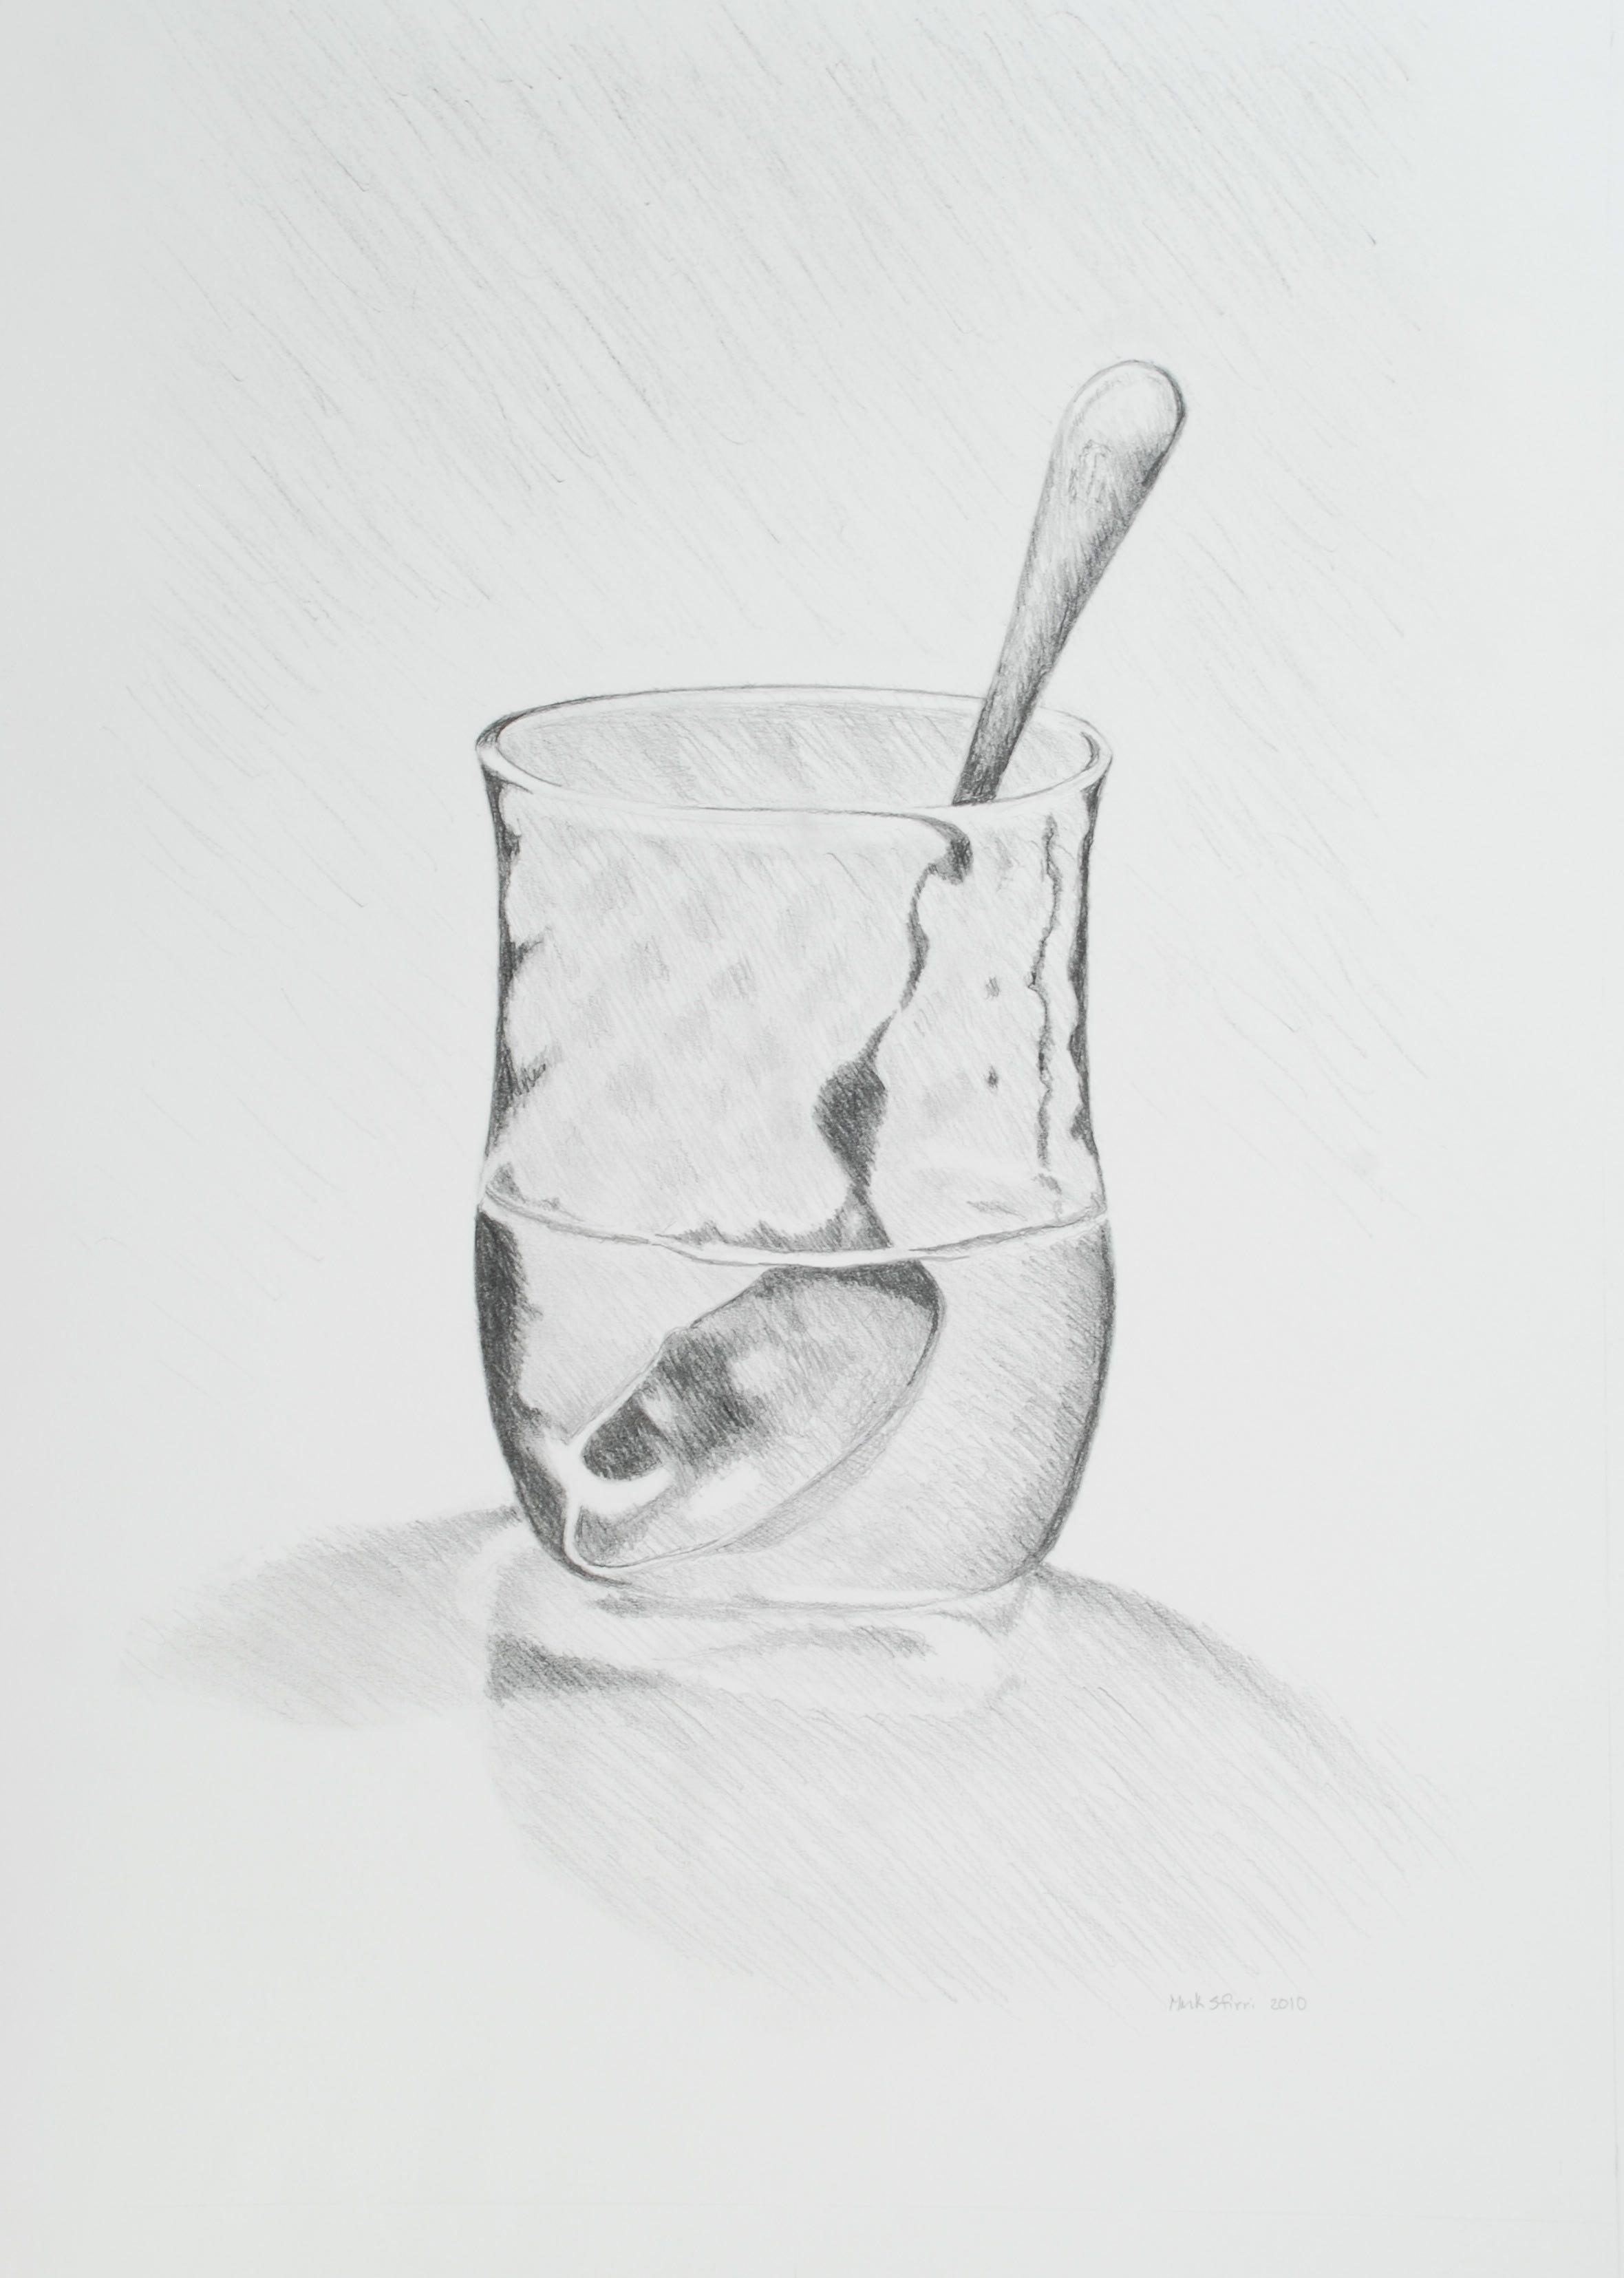 Spoon in Glass